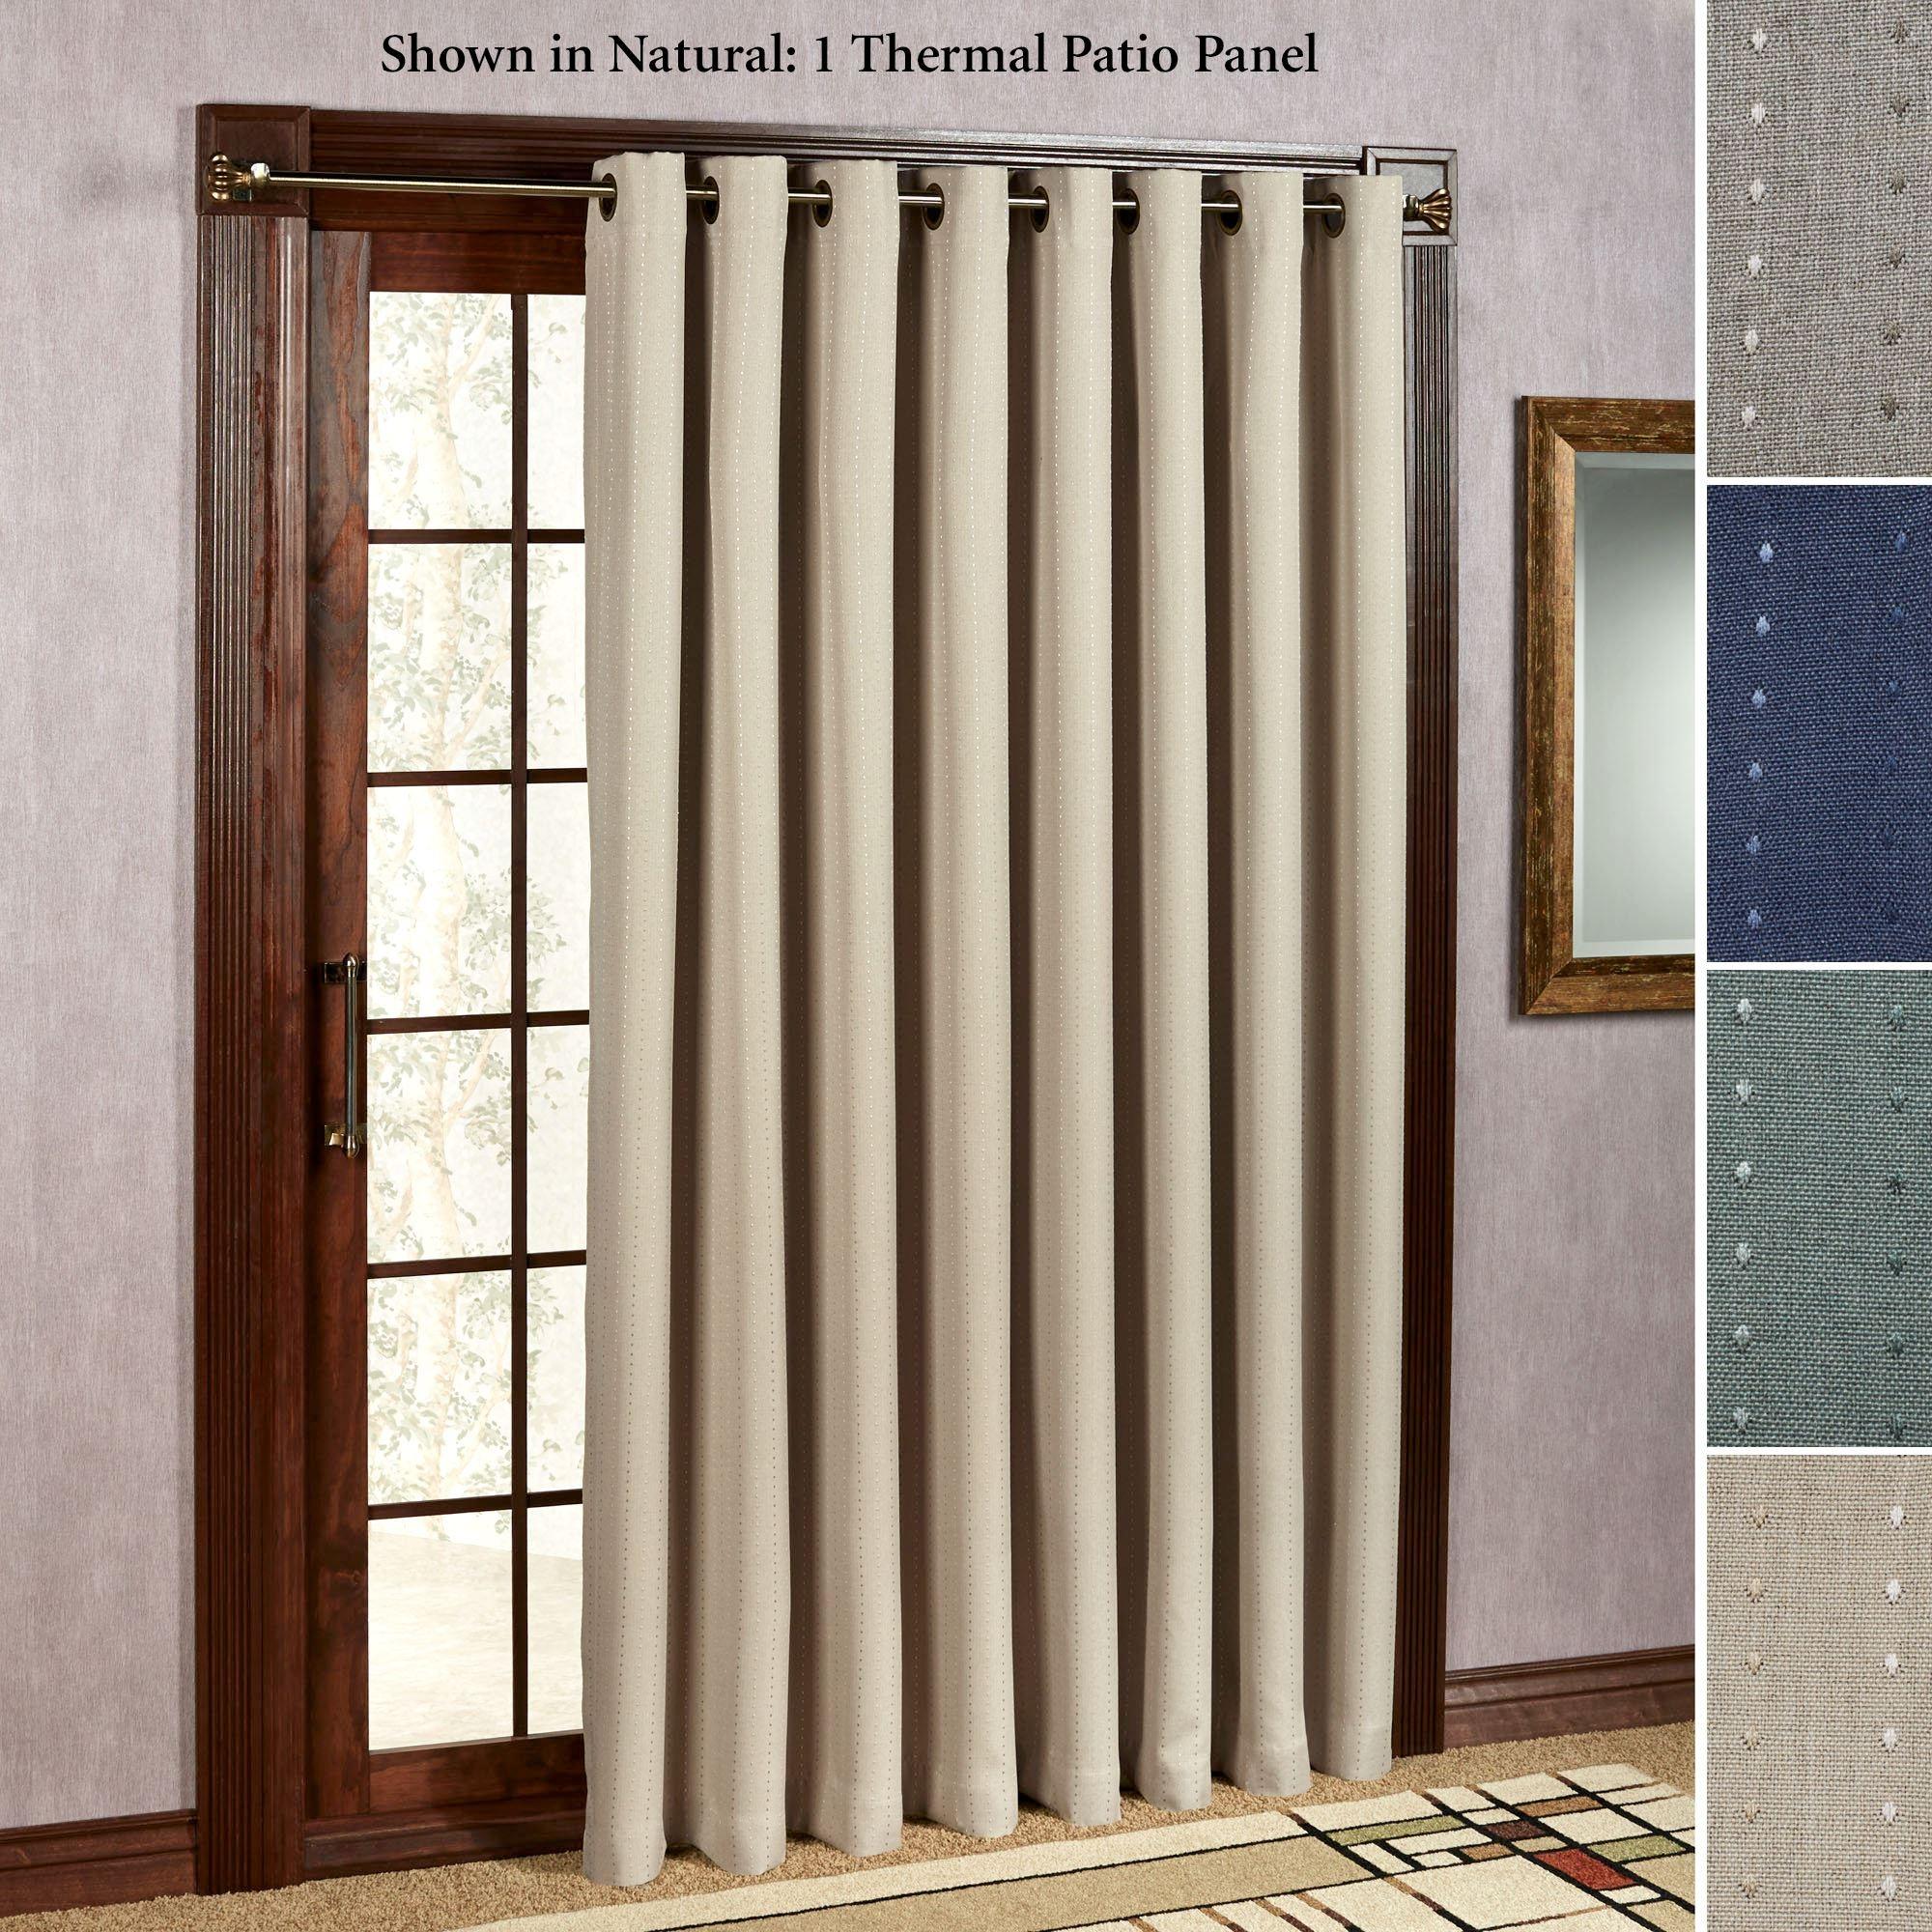 Curtains For Sliding DoorsCurtains For Sliding Doors